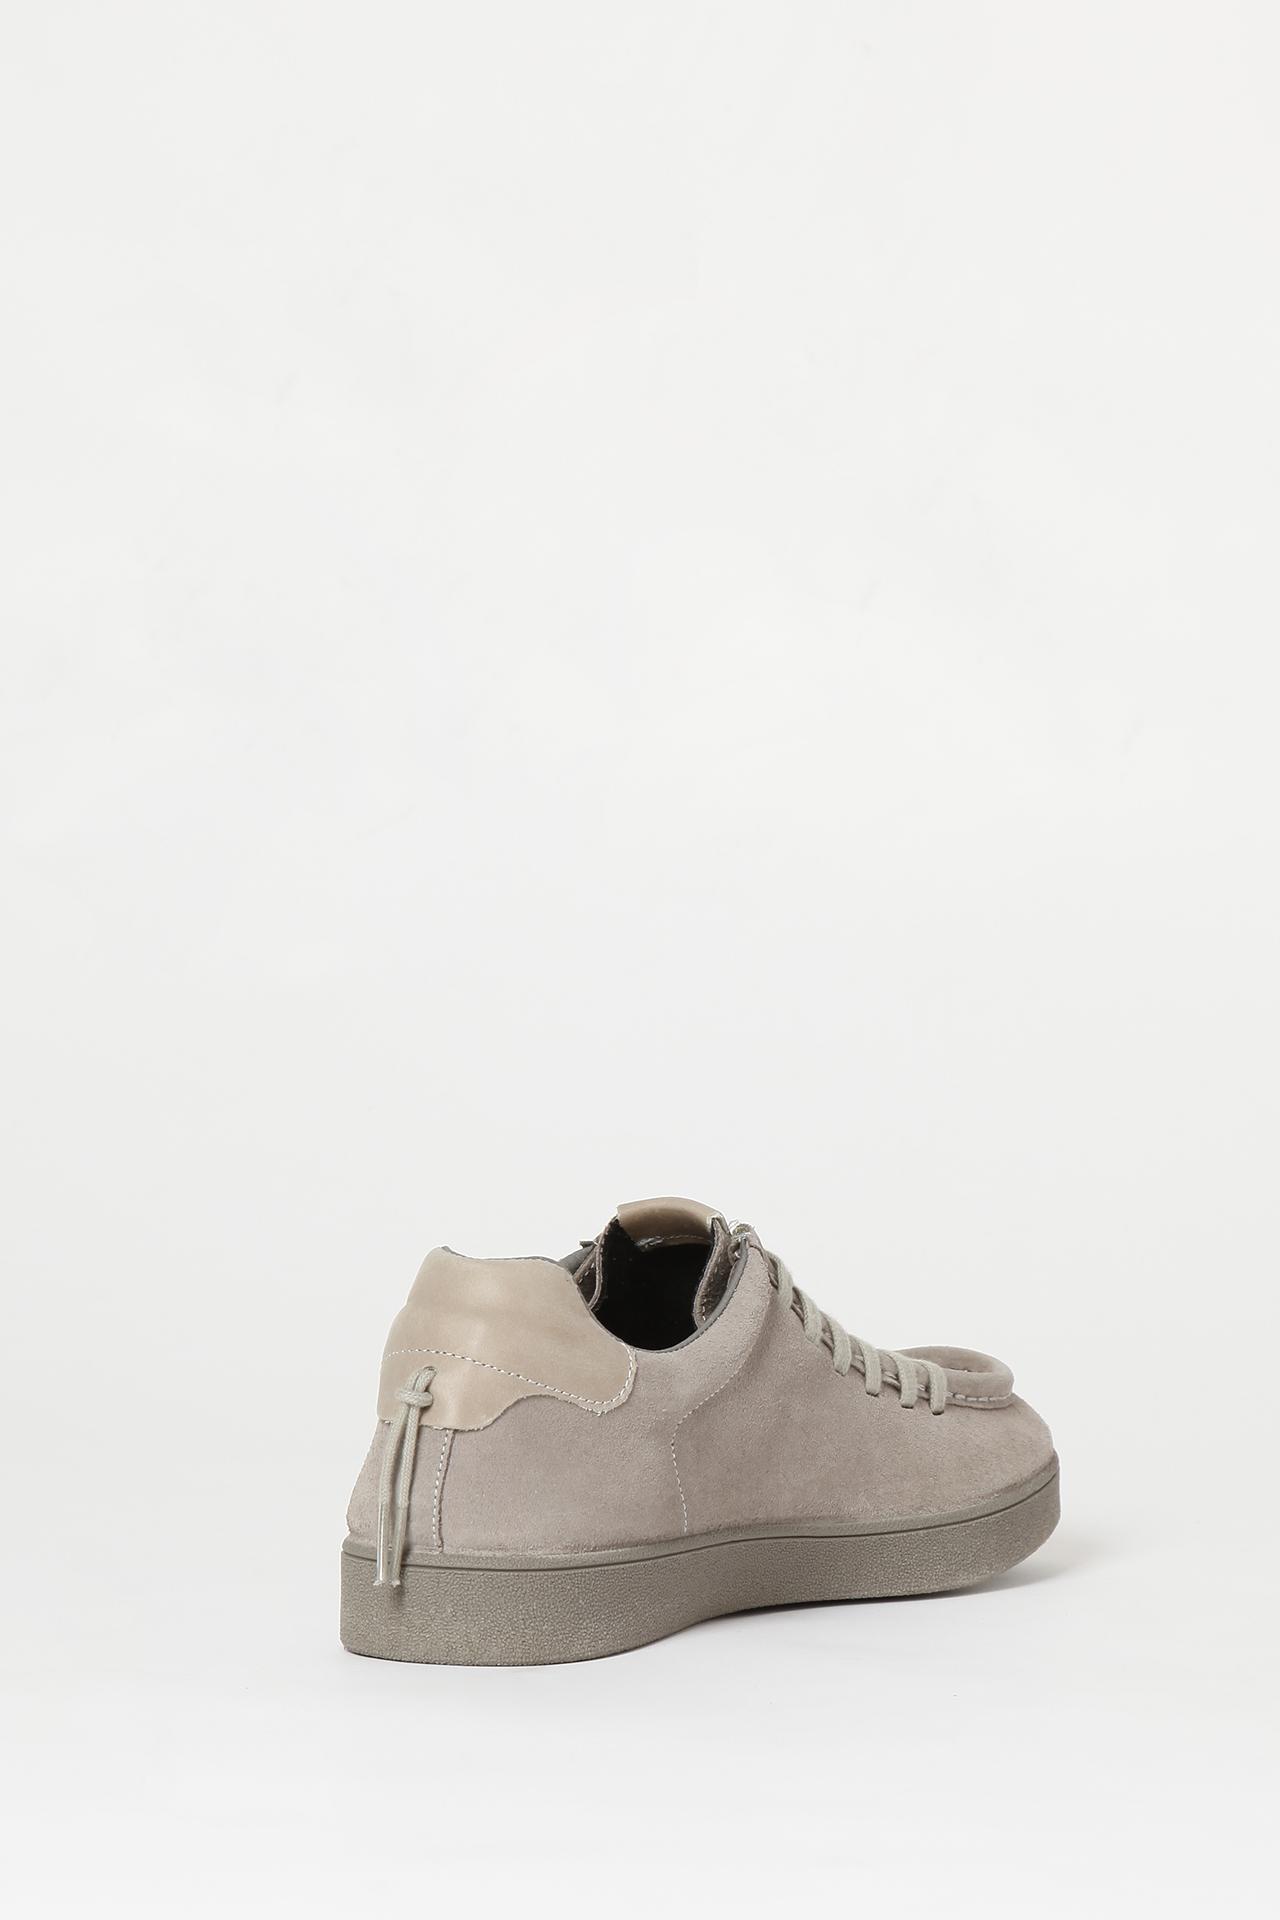 BARRACUDA   Shoes   BU3386ATAUPE